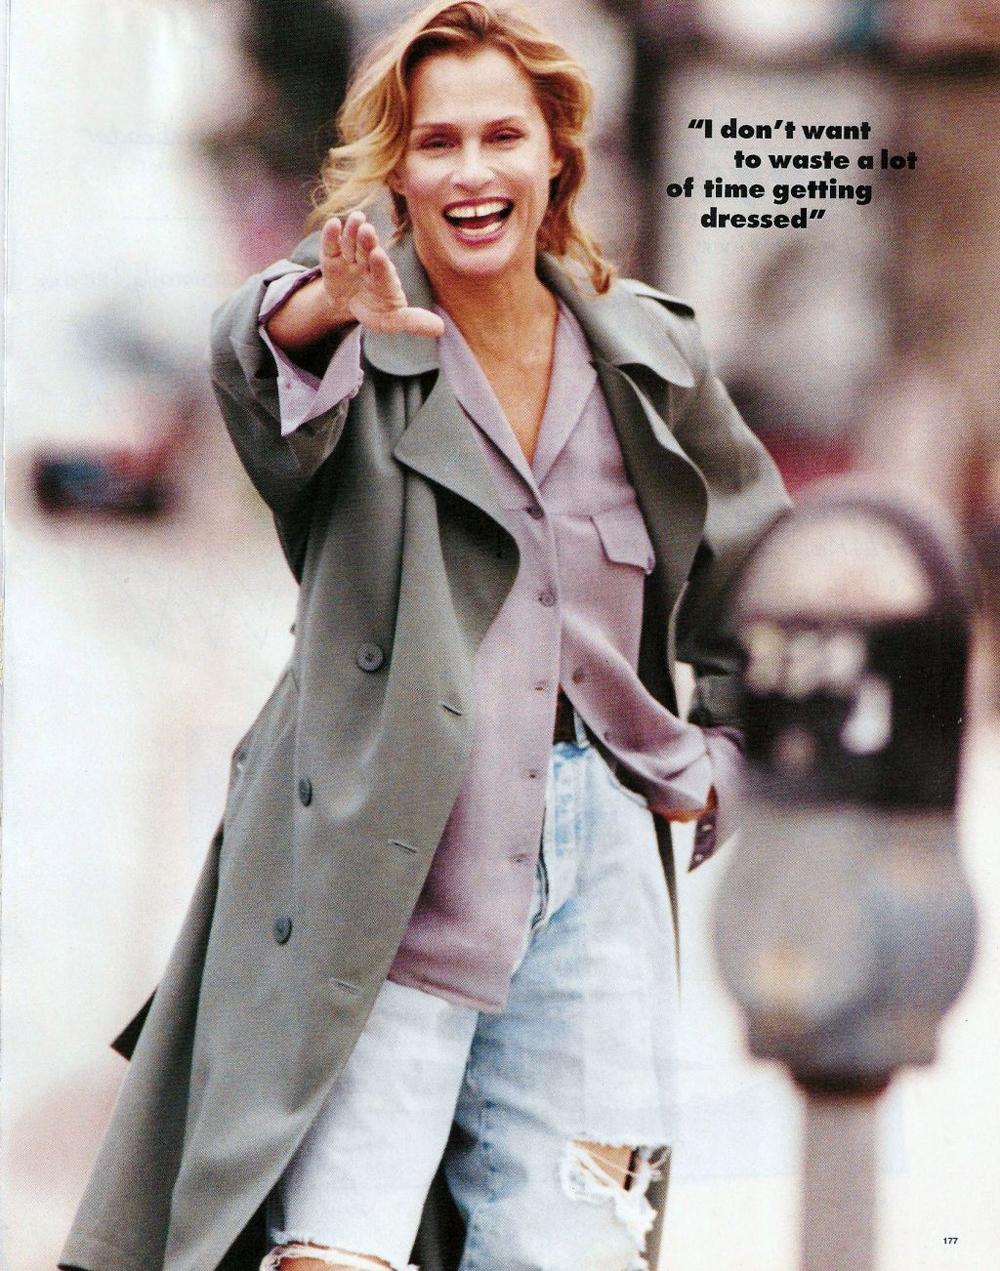 Elle US February 1994 via www.fashionedbylove.co.uk